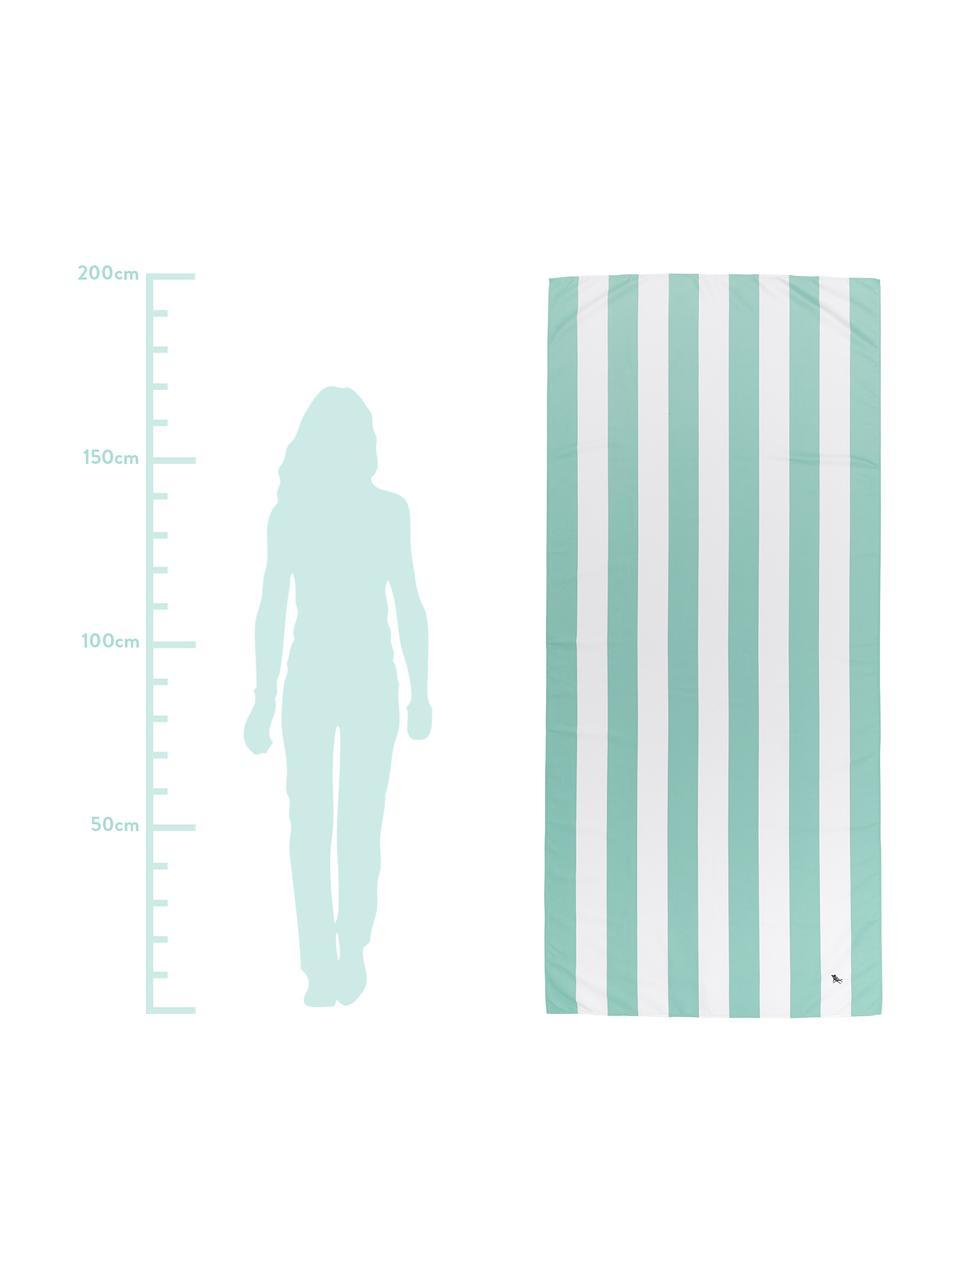 Telo mare in microfibra Cabana, asciugatura rapida, Microfibra (80% poliestere, 20% poliammide), Verde menta, bianco, Larg. 90 x Lung. 200 cm